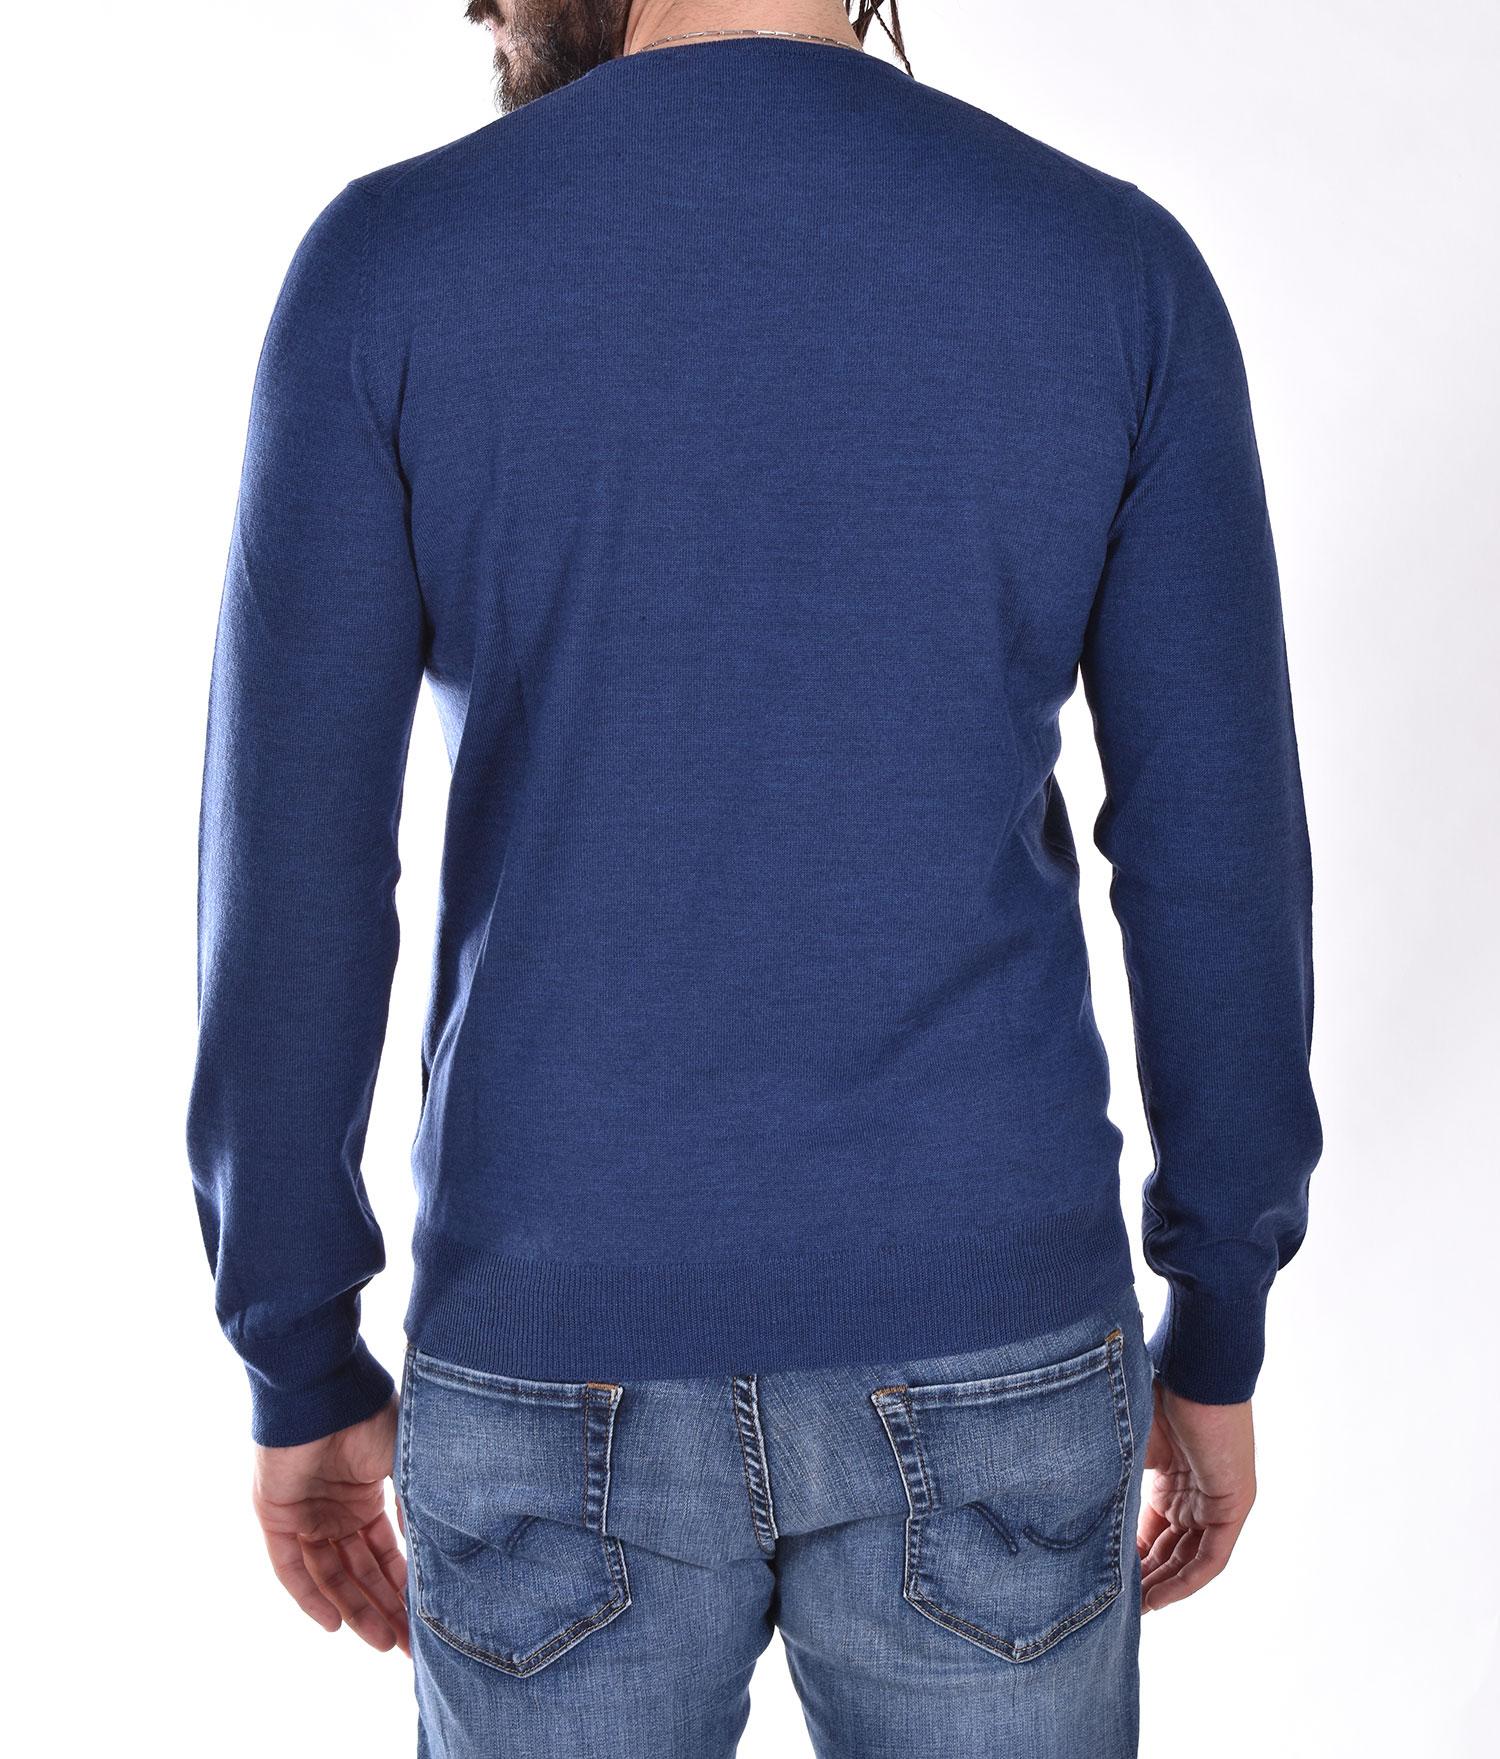 Gran Sasso extrafine merinos light blue sweater GRAN SASSO   5516714290589